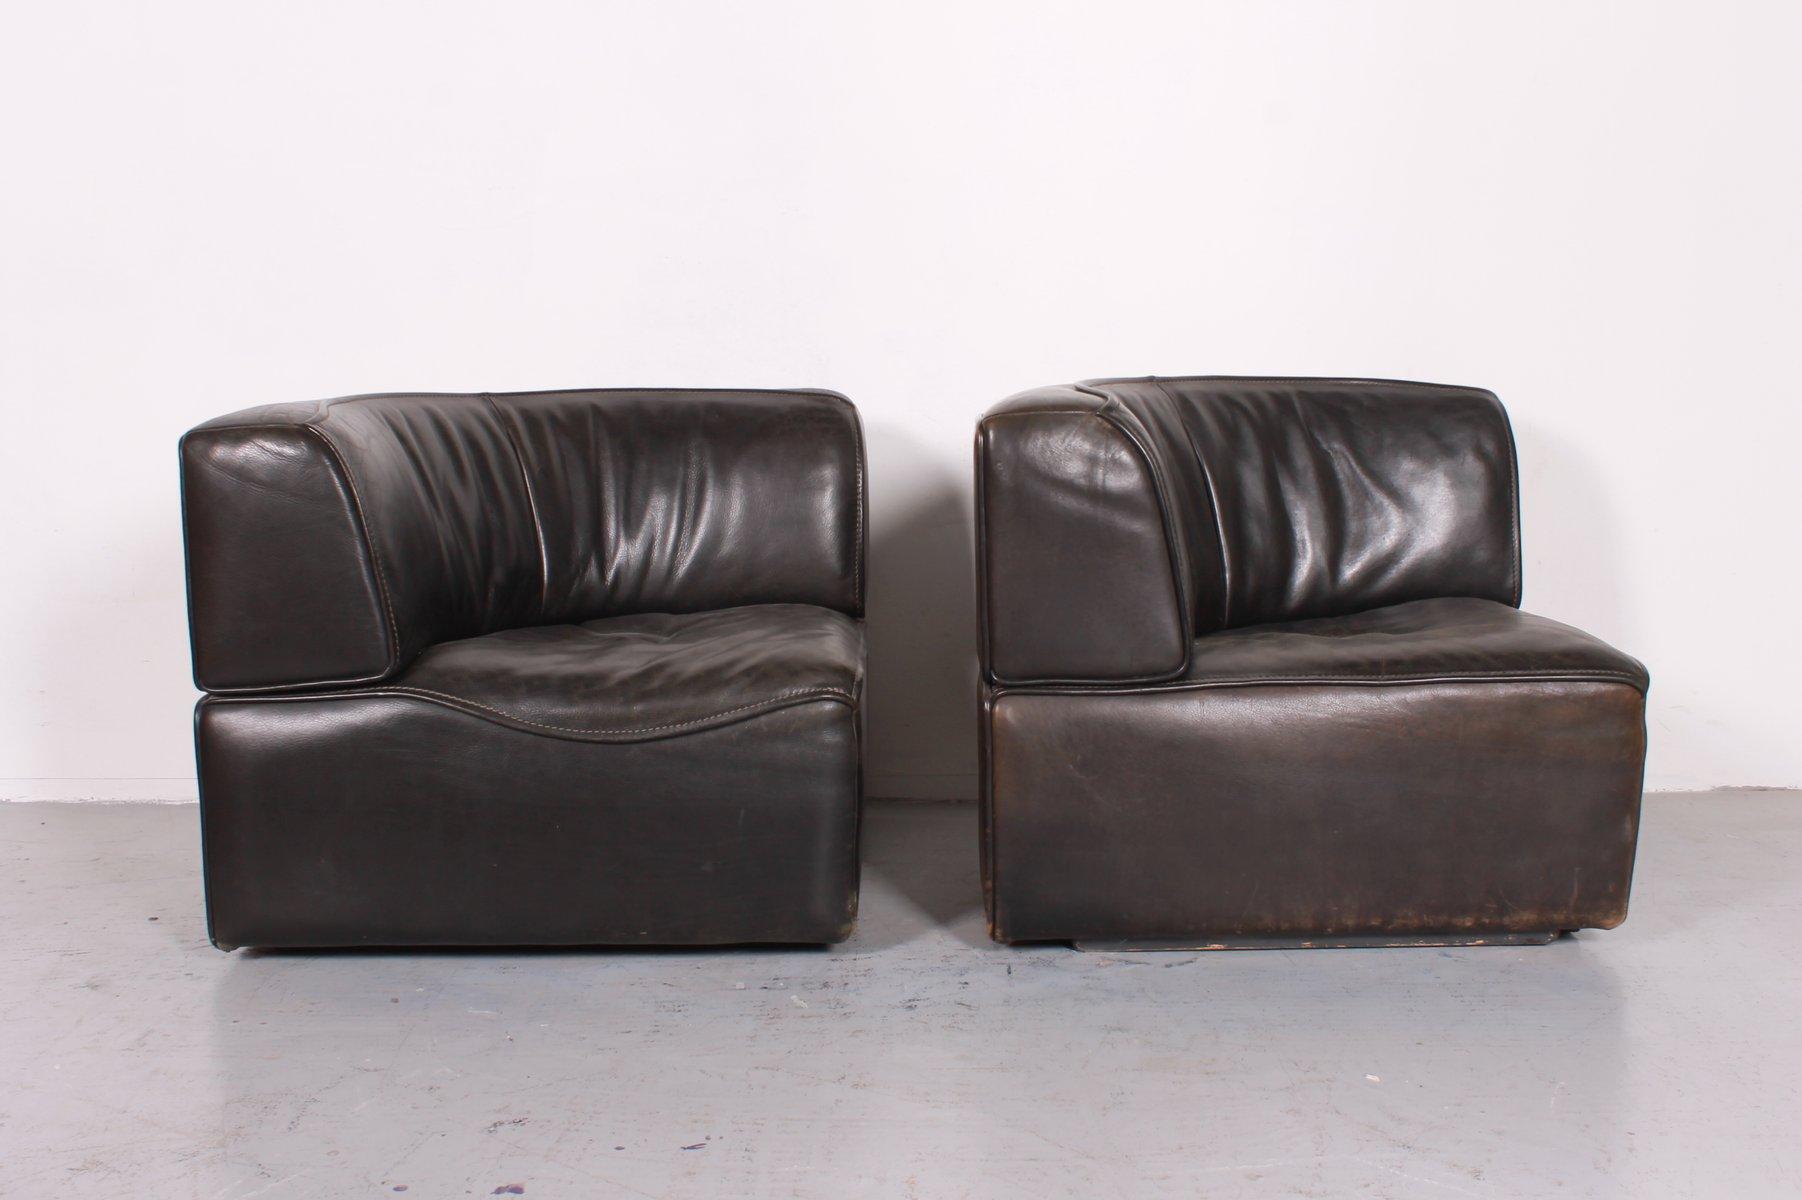 modulares ds15 sofa von de sede 1965 bei pamono kaufen. Black Bedroom Furniture Sets. Home Design Ideas